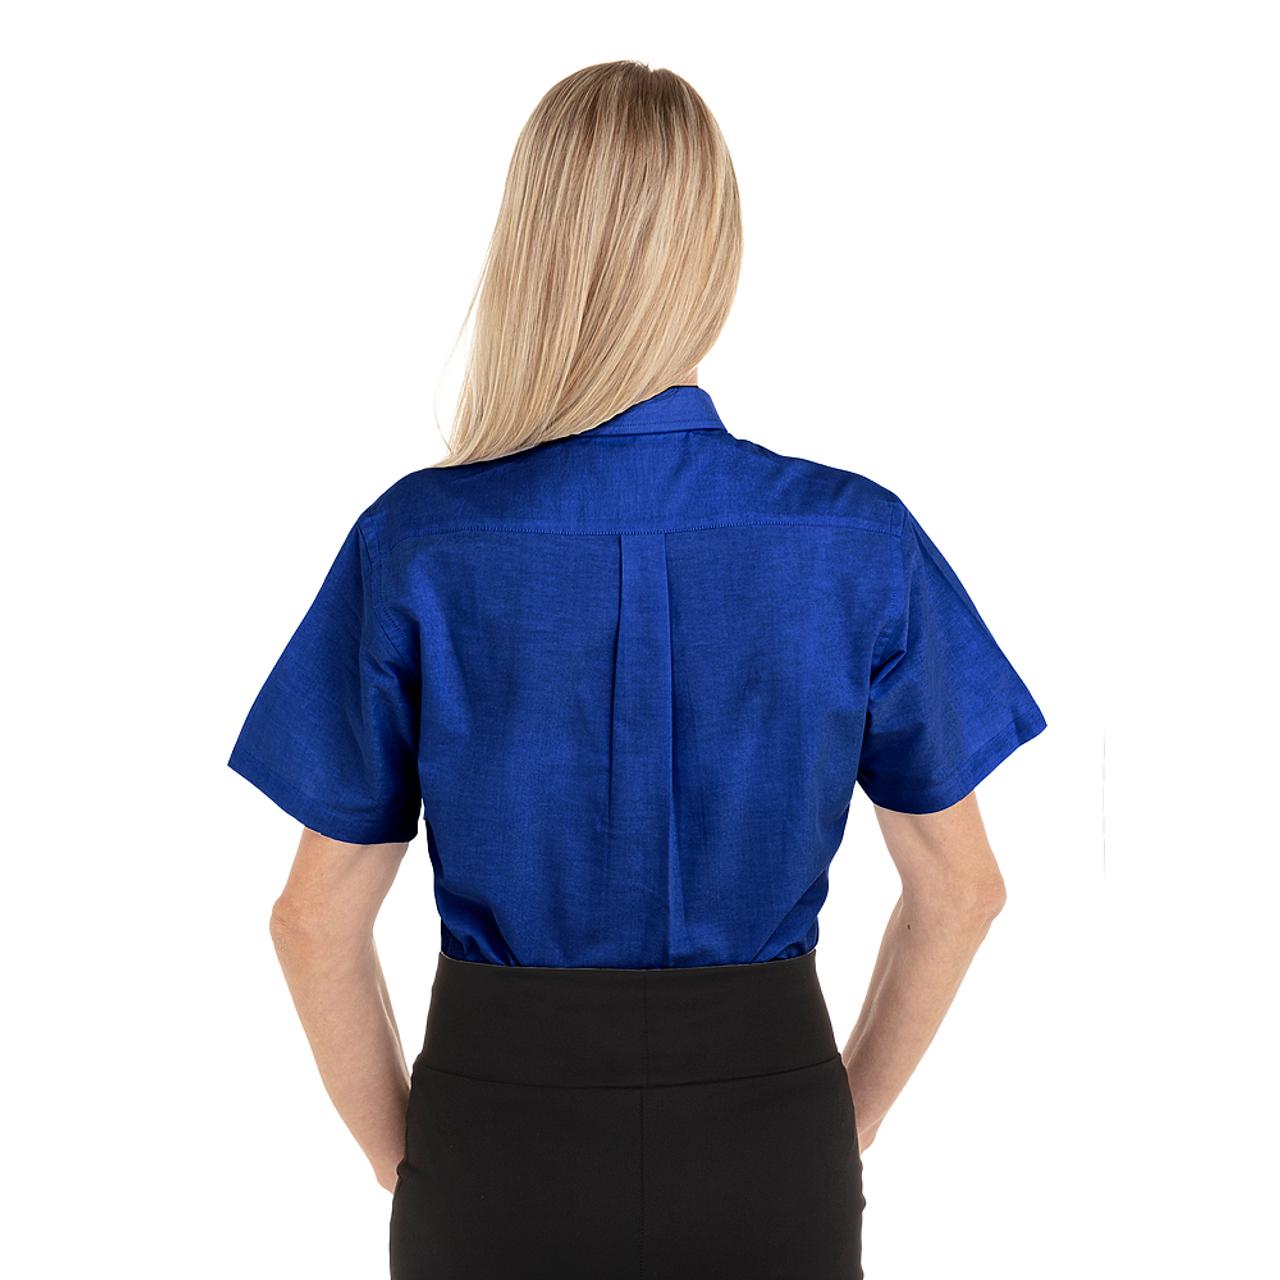 French Blue - Back, 18CV301 Van Heusen Ladies' Short Sleeve Oxford Shirt -T-shirt.ca